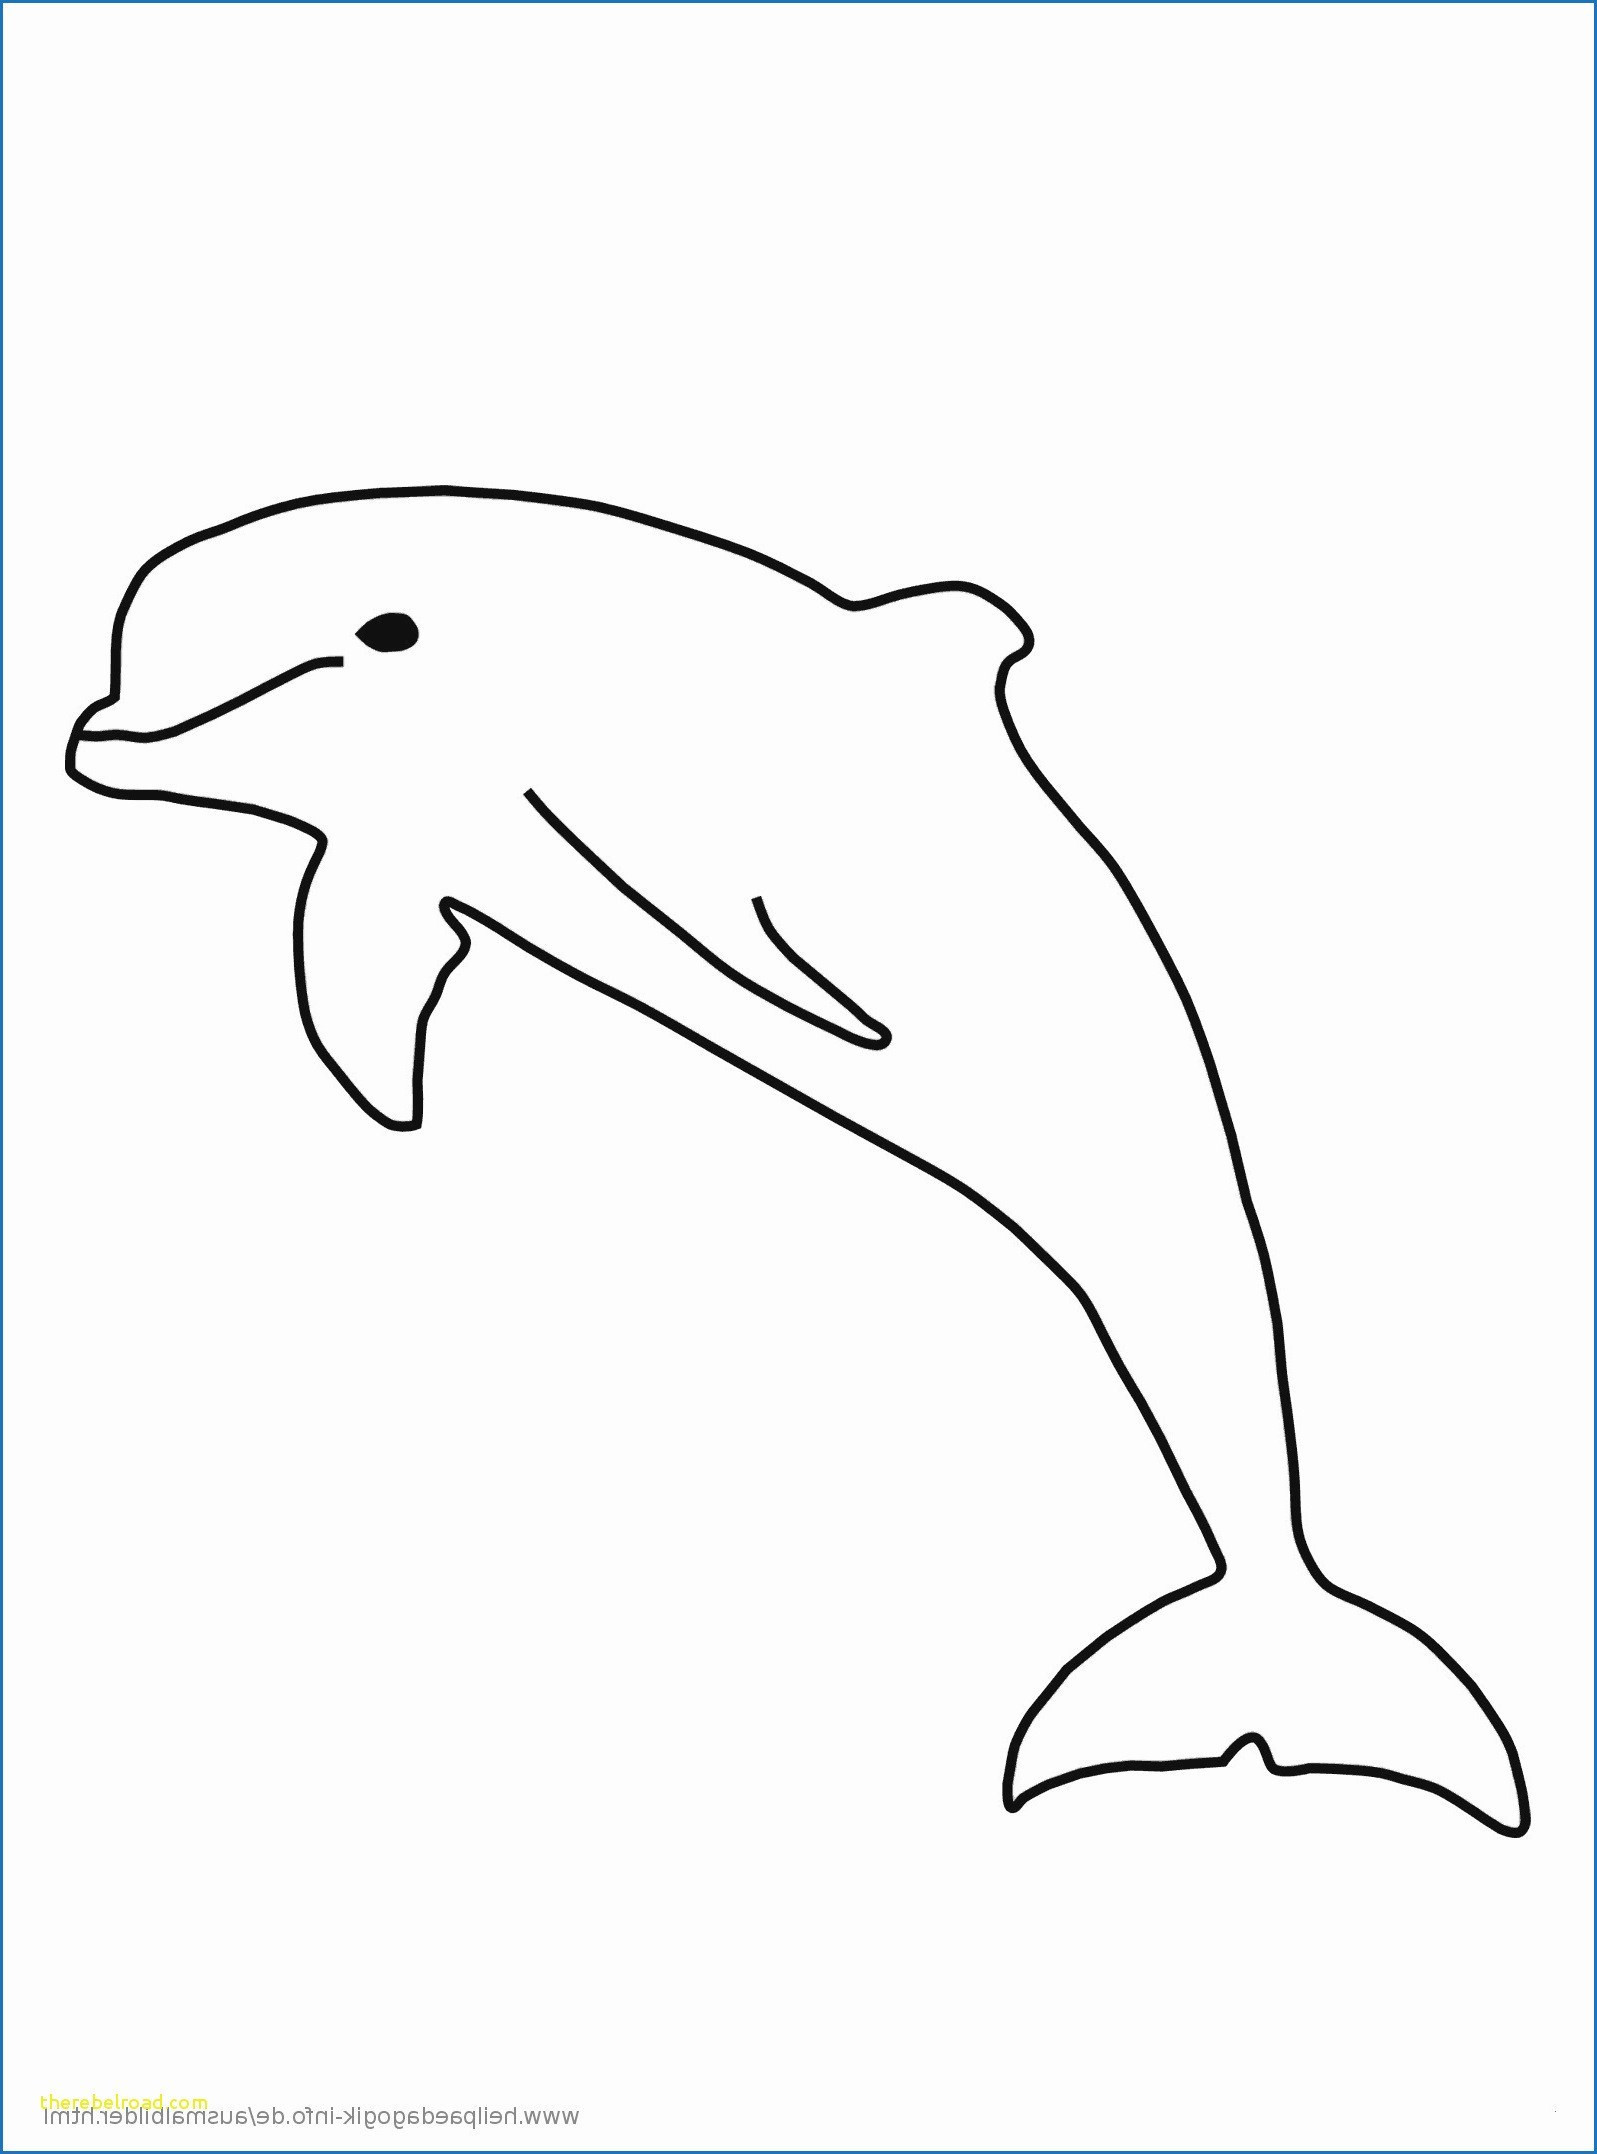 Ausmalbilder Prinzessin Meerjungfrau Neu Ausmalbilder Meerjungfrau Mit Delfin Mandala Ausmalen Jxdu Fotos